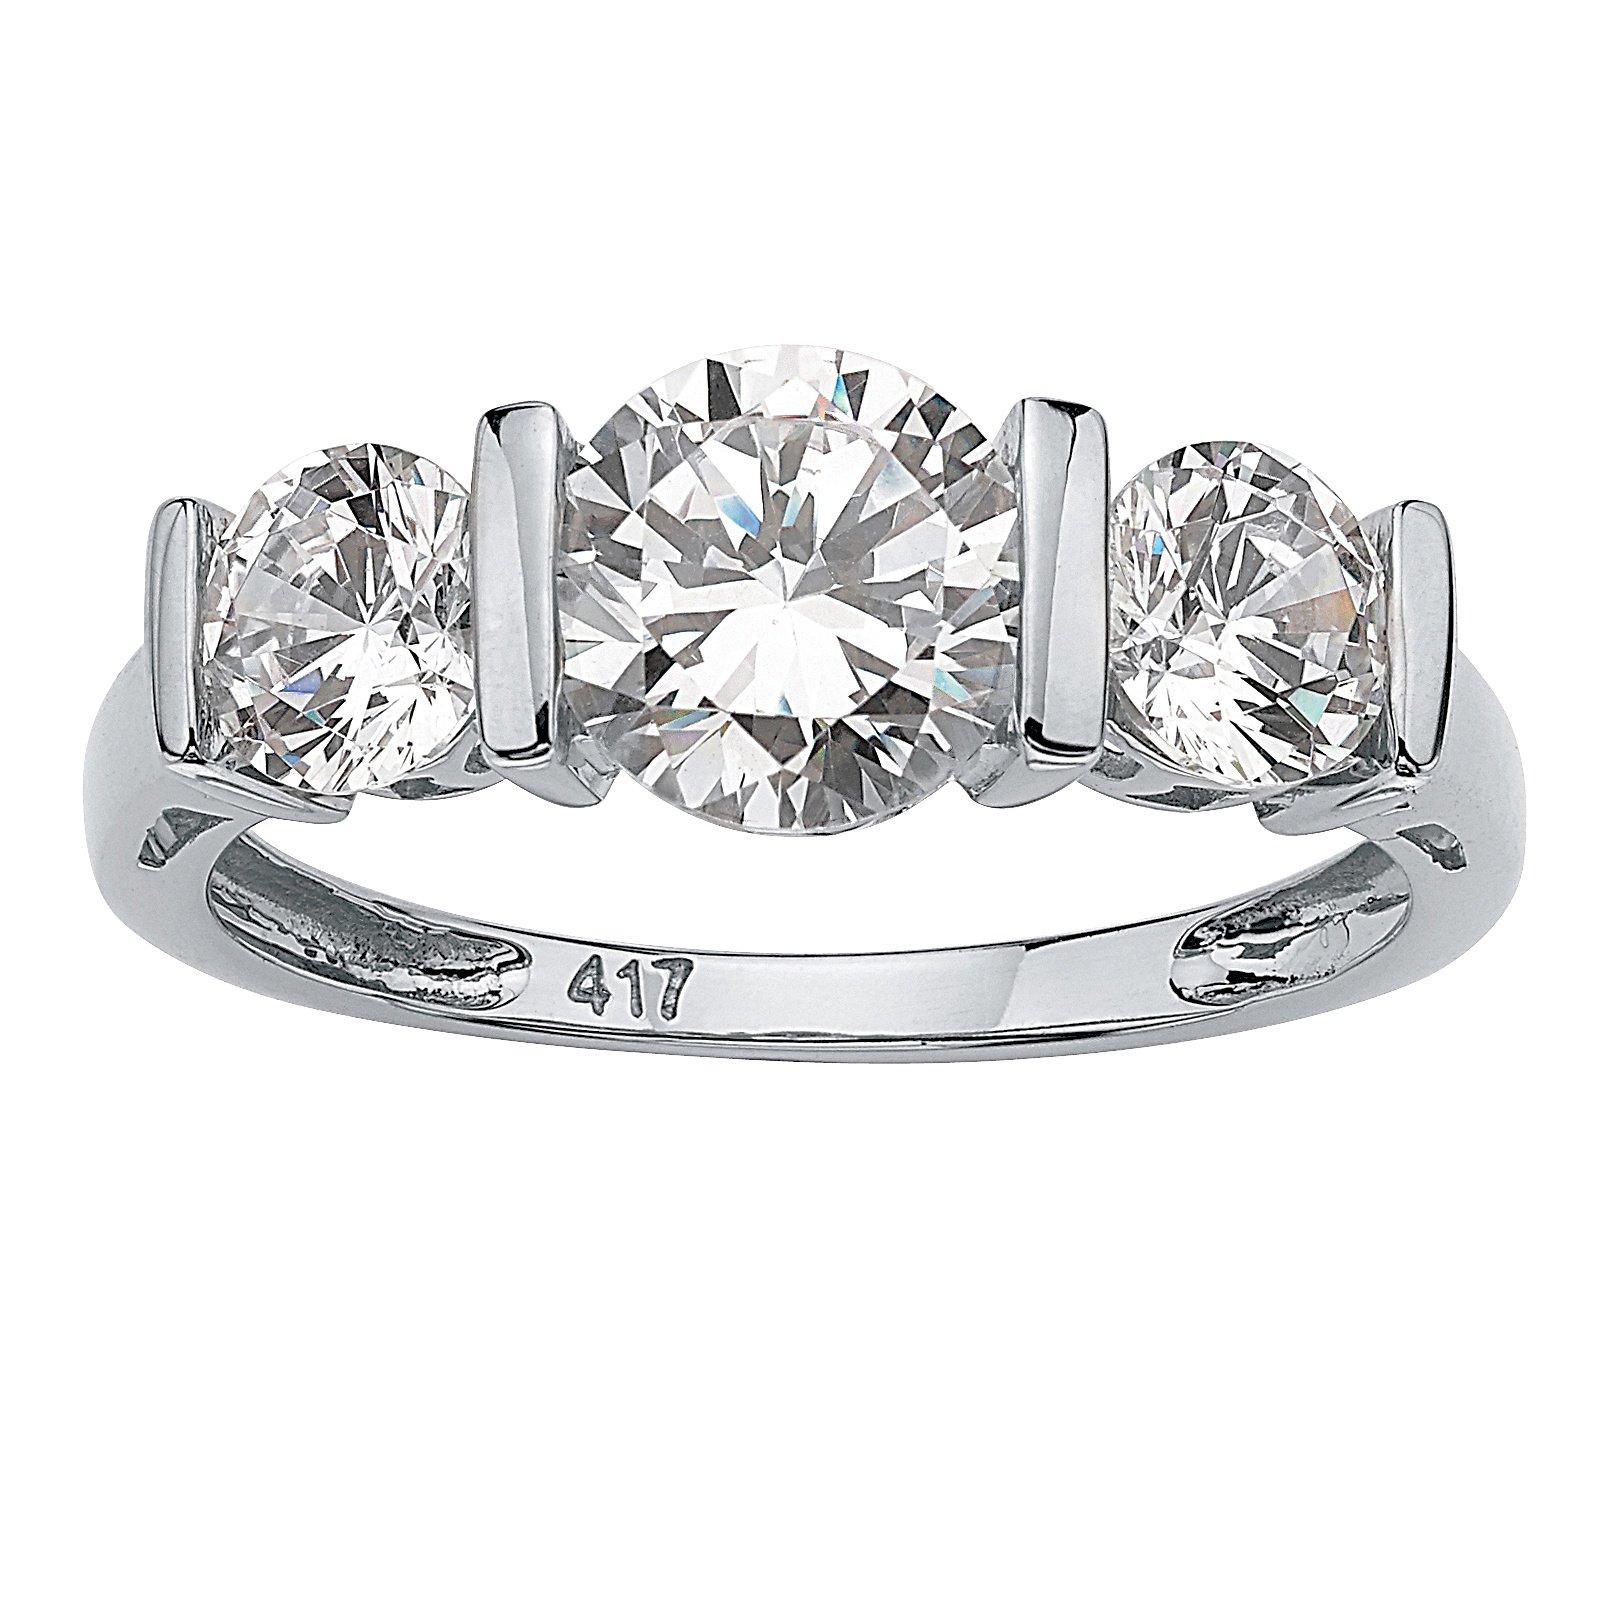 Solid 10K White Gold Round Cubic Zirconia Bar-Set 3-Stone Wedding Anniversary Ring Size 7